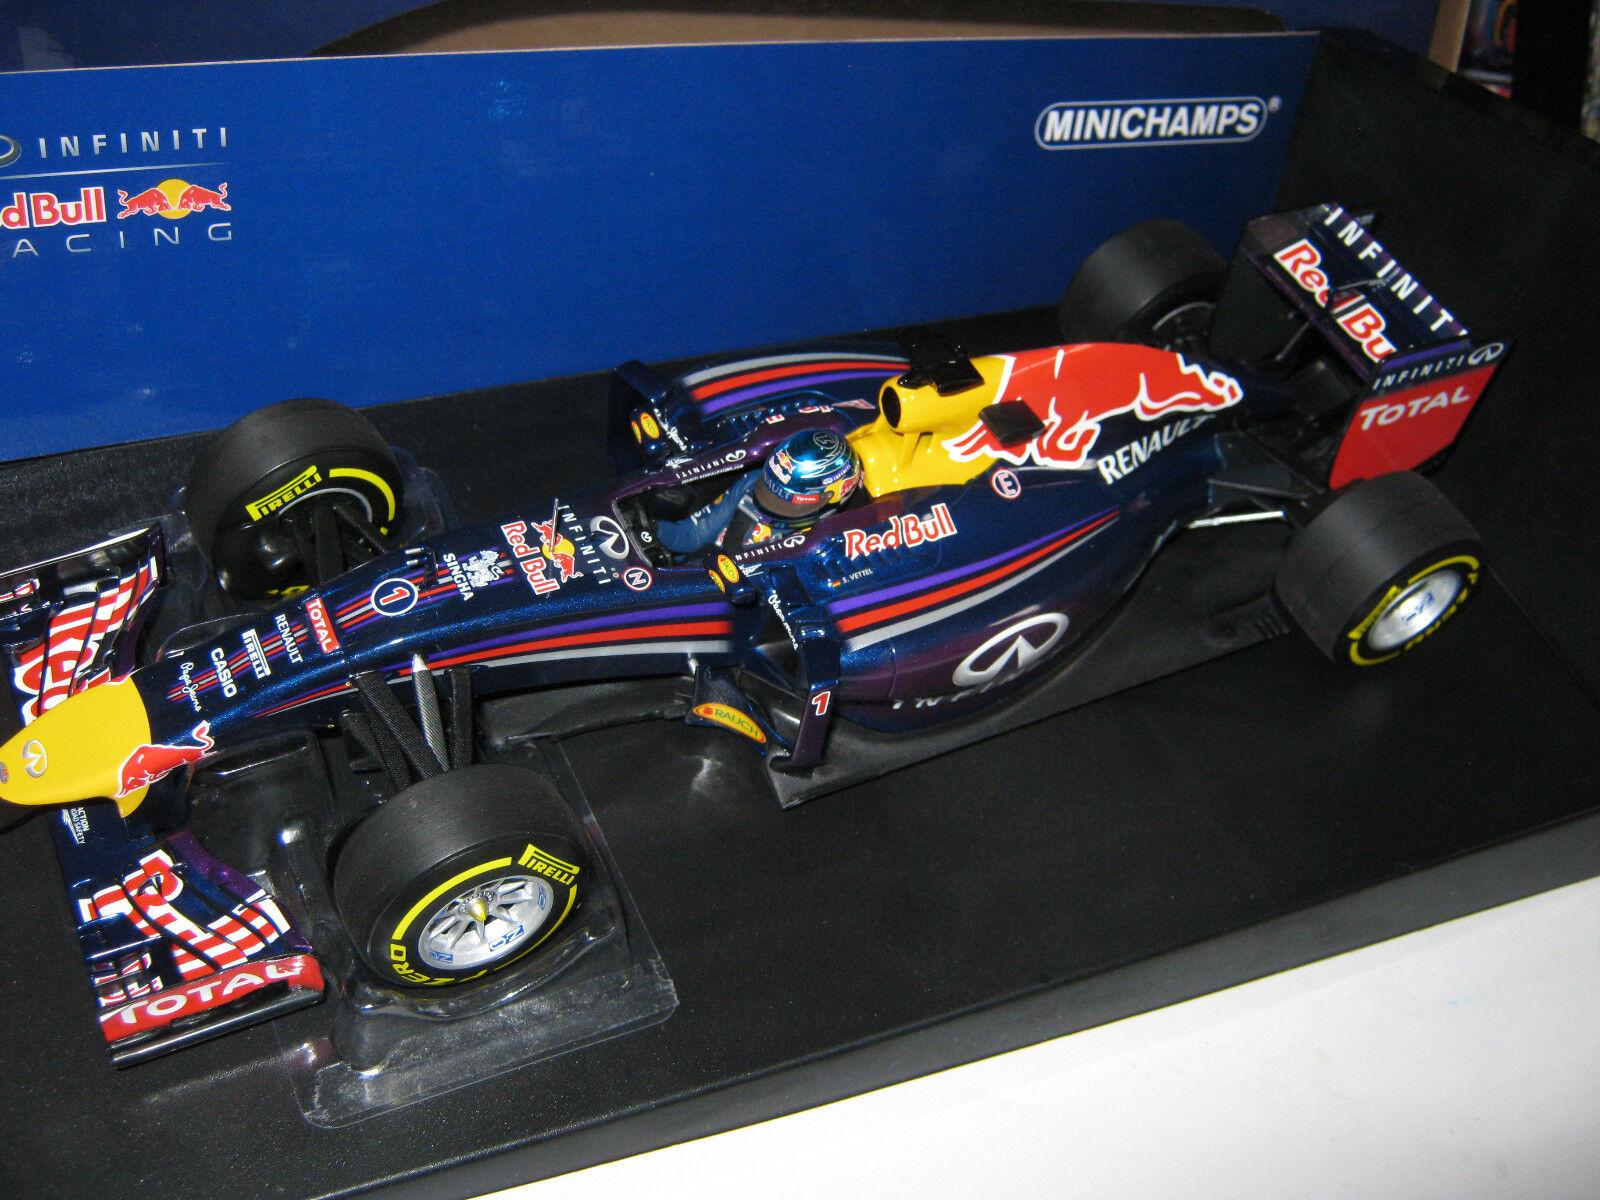 1 18 rot BULL RACING RB10 2014 S. Vettel MINICHAMPS 110140001  Neu OVP  | Deutschland Berlin